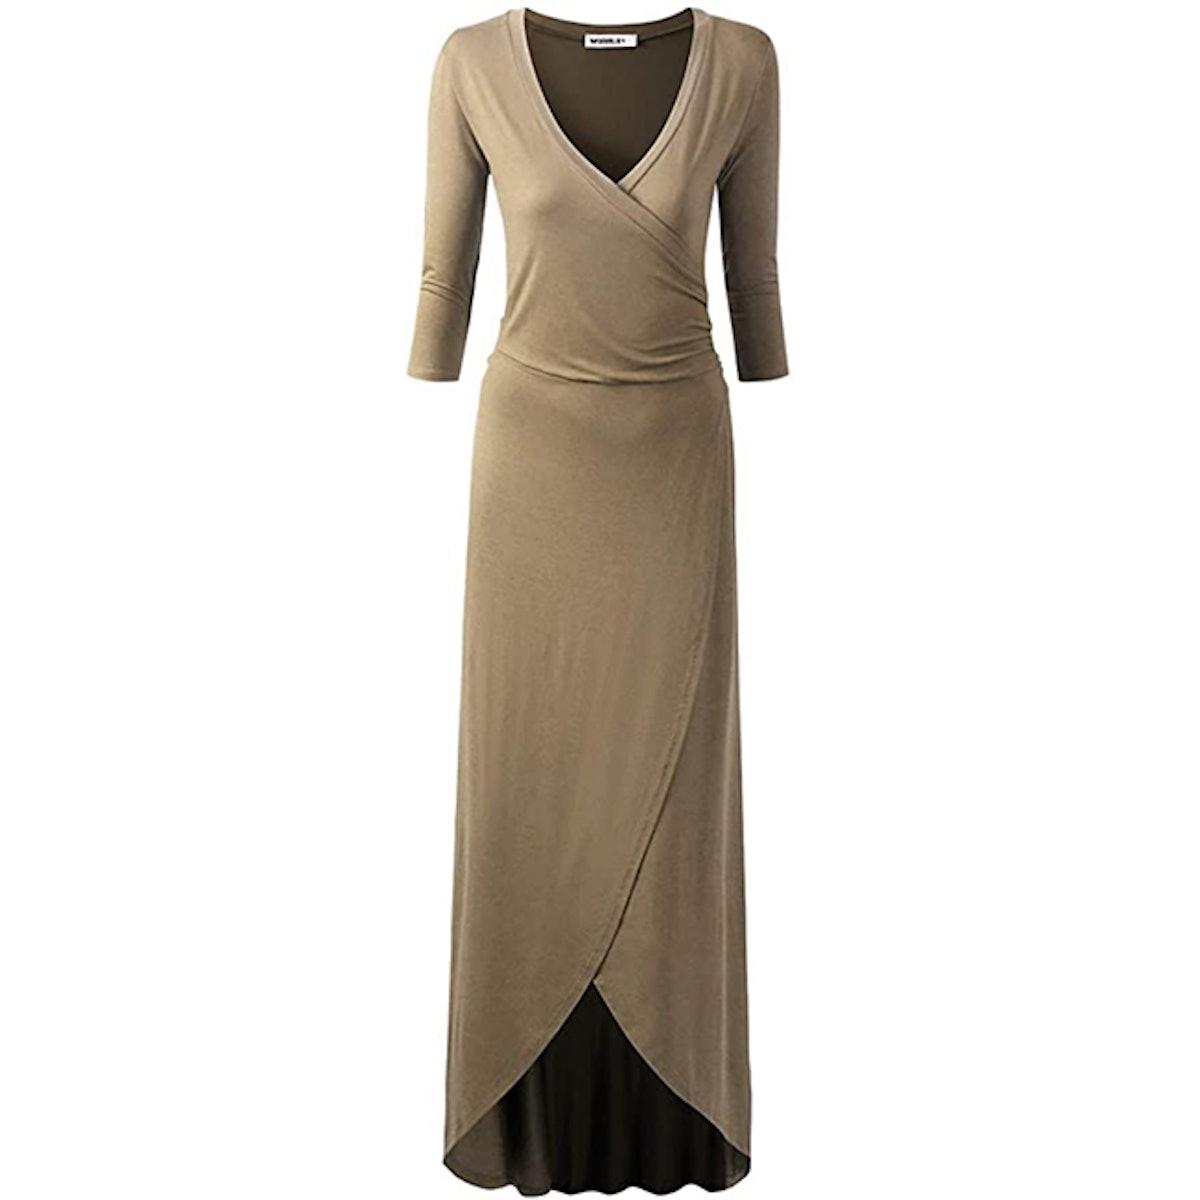 NINEXIS 3/4 Sleeve Faux Wrap Maxi Dress